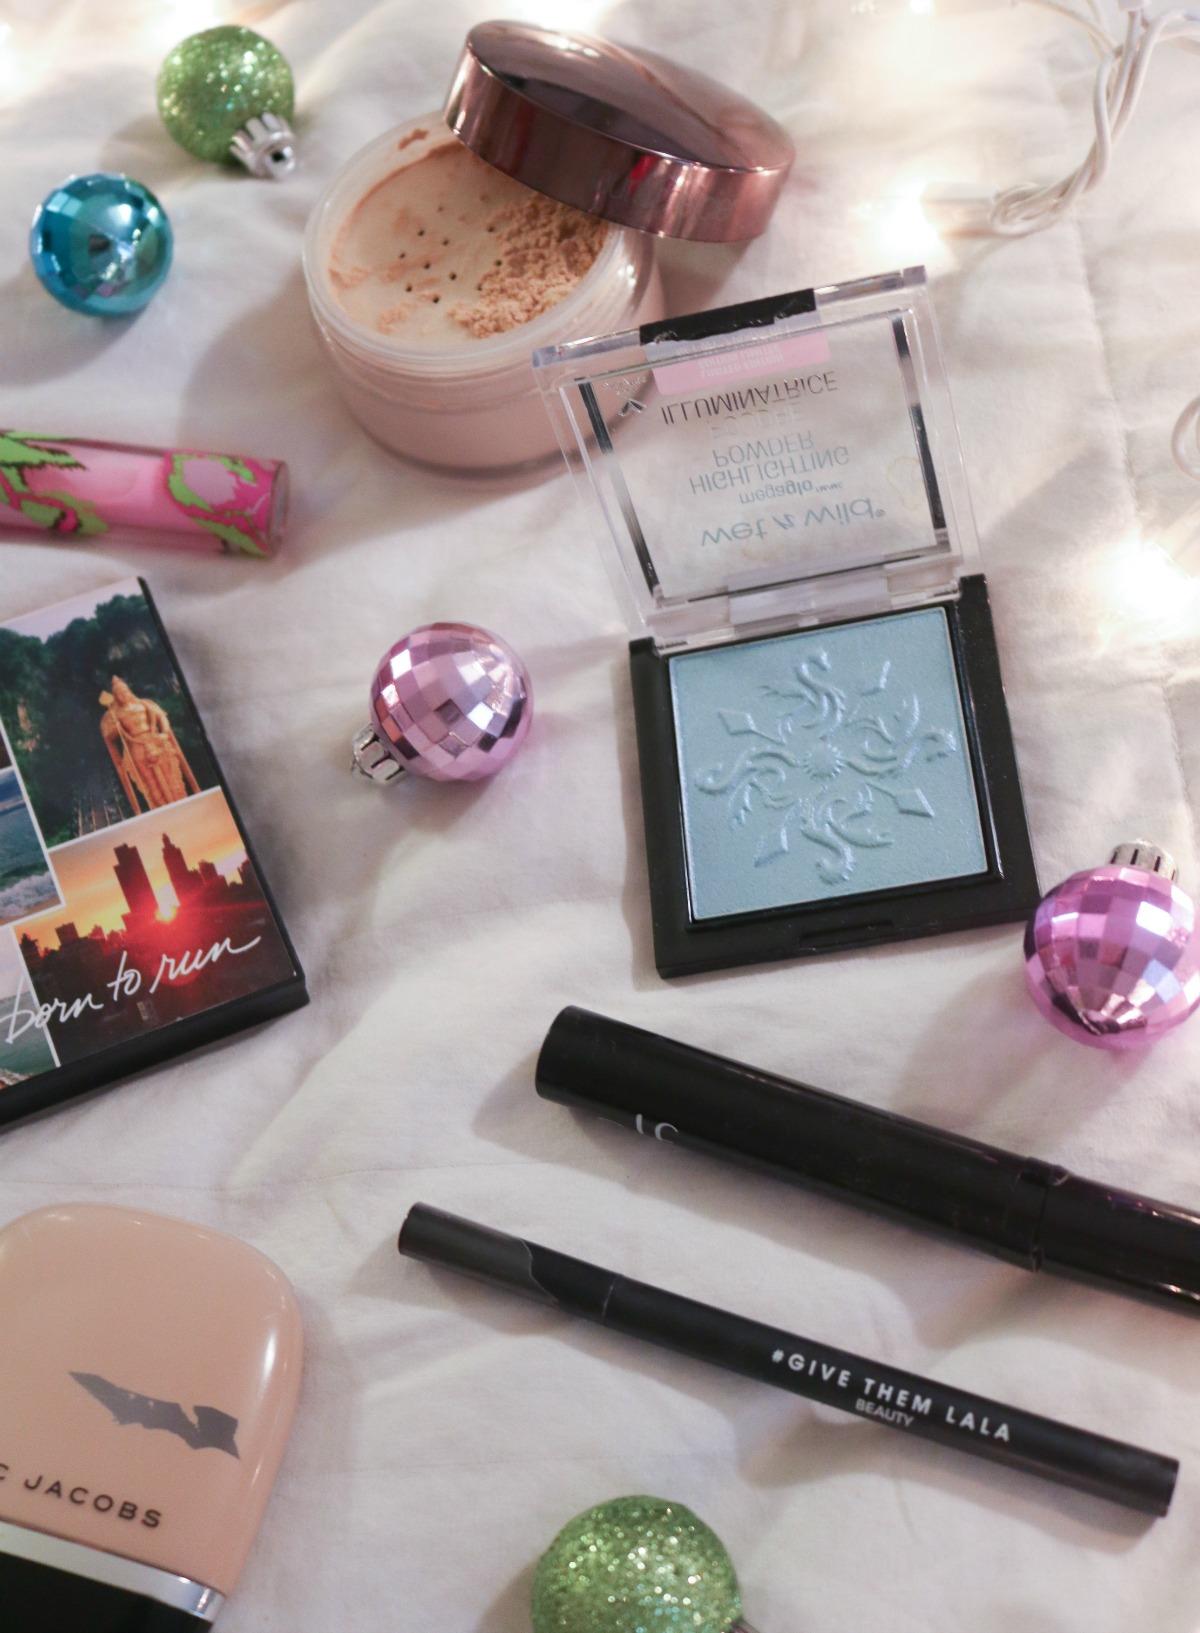 Best 2018 Makeup Releases I Beauty Blog DreaminLace.com #Bestof2018 #MakeupAddict